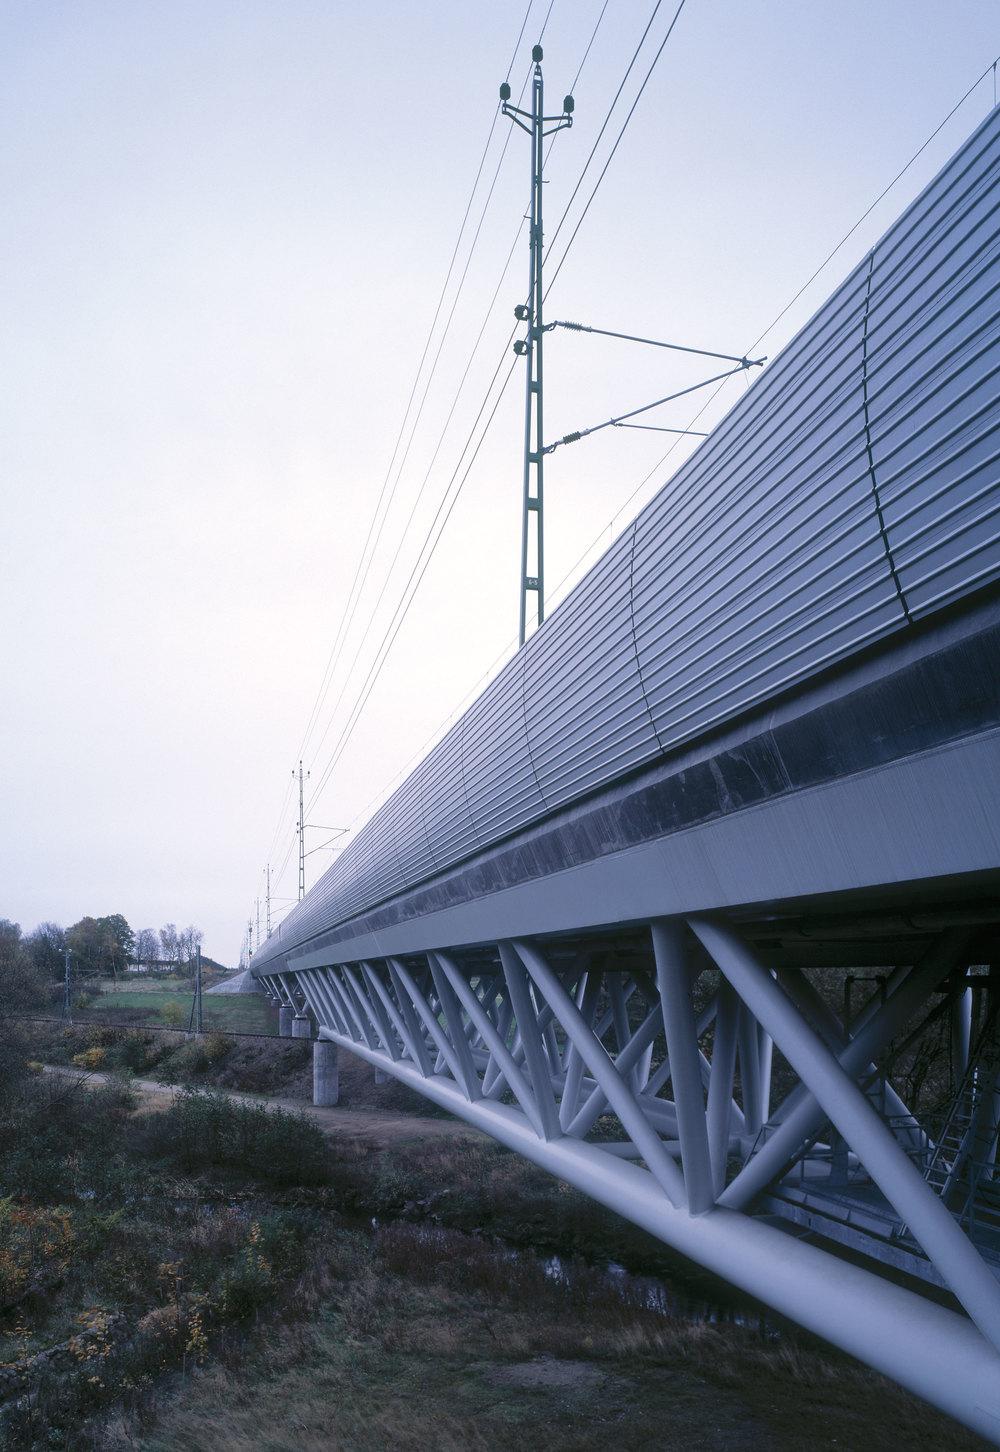 DW-8022-råå-ån-23-H.jpg